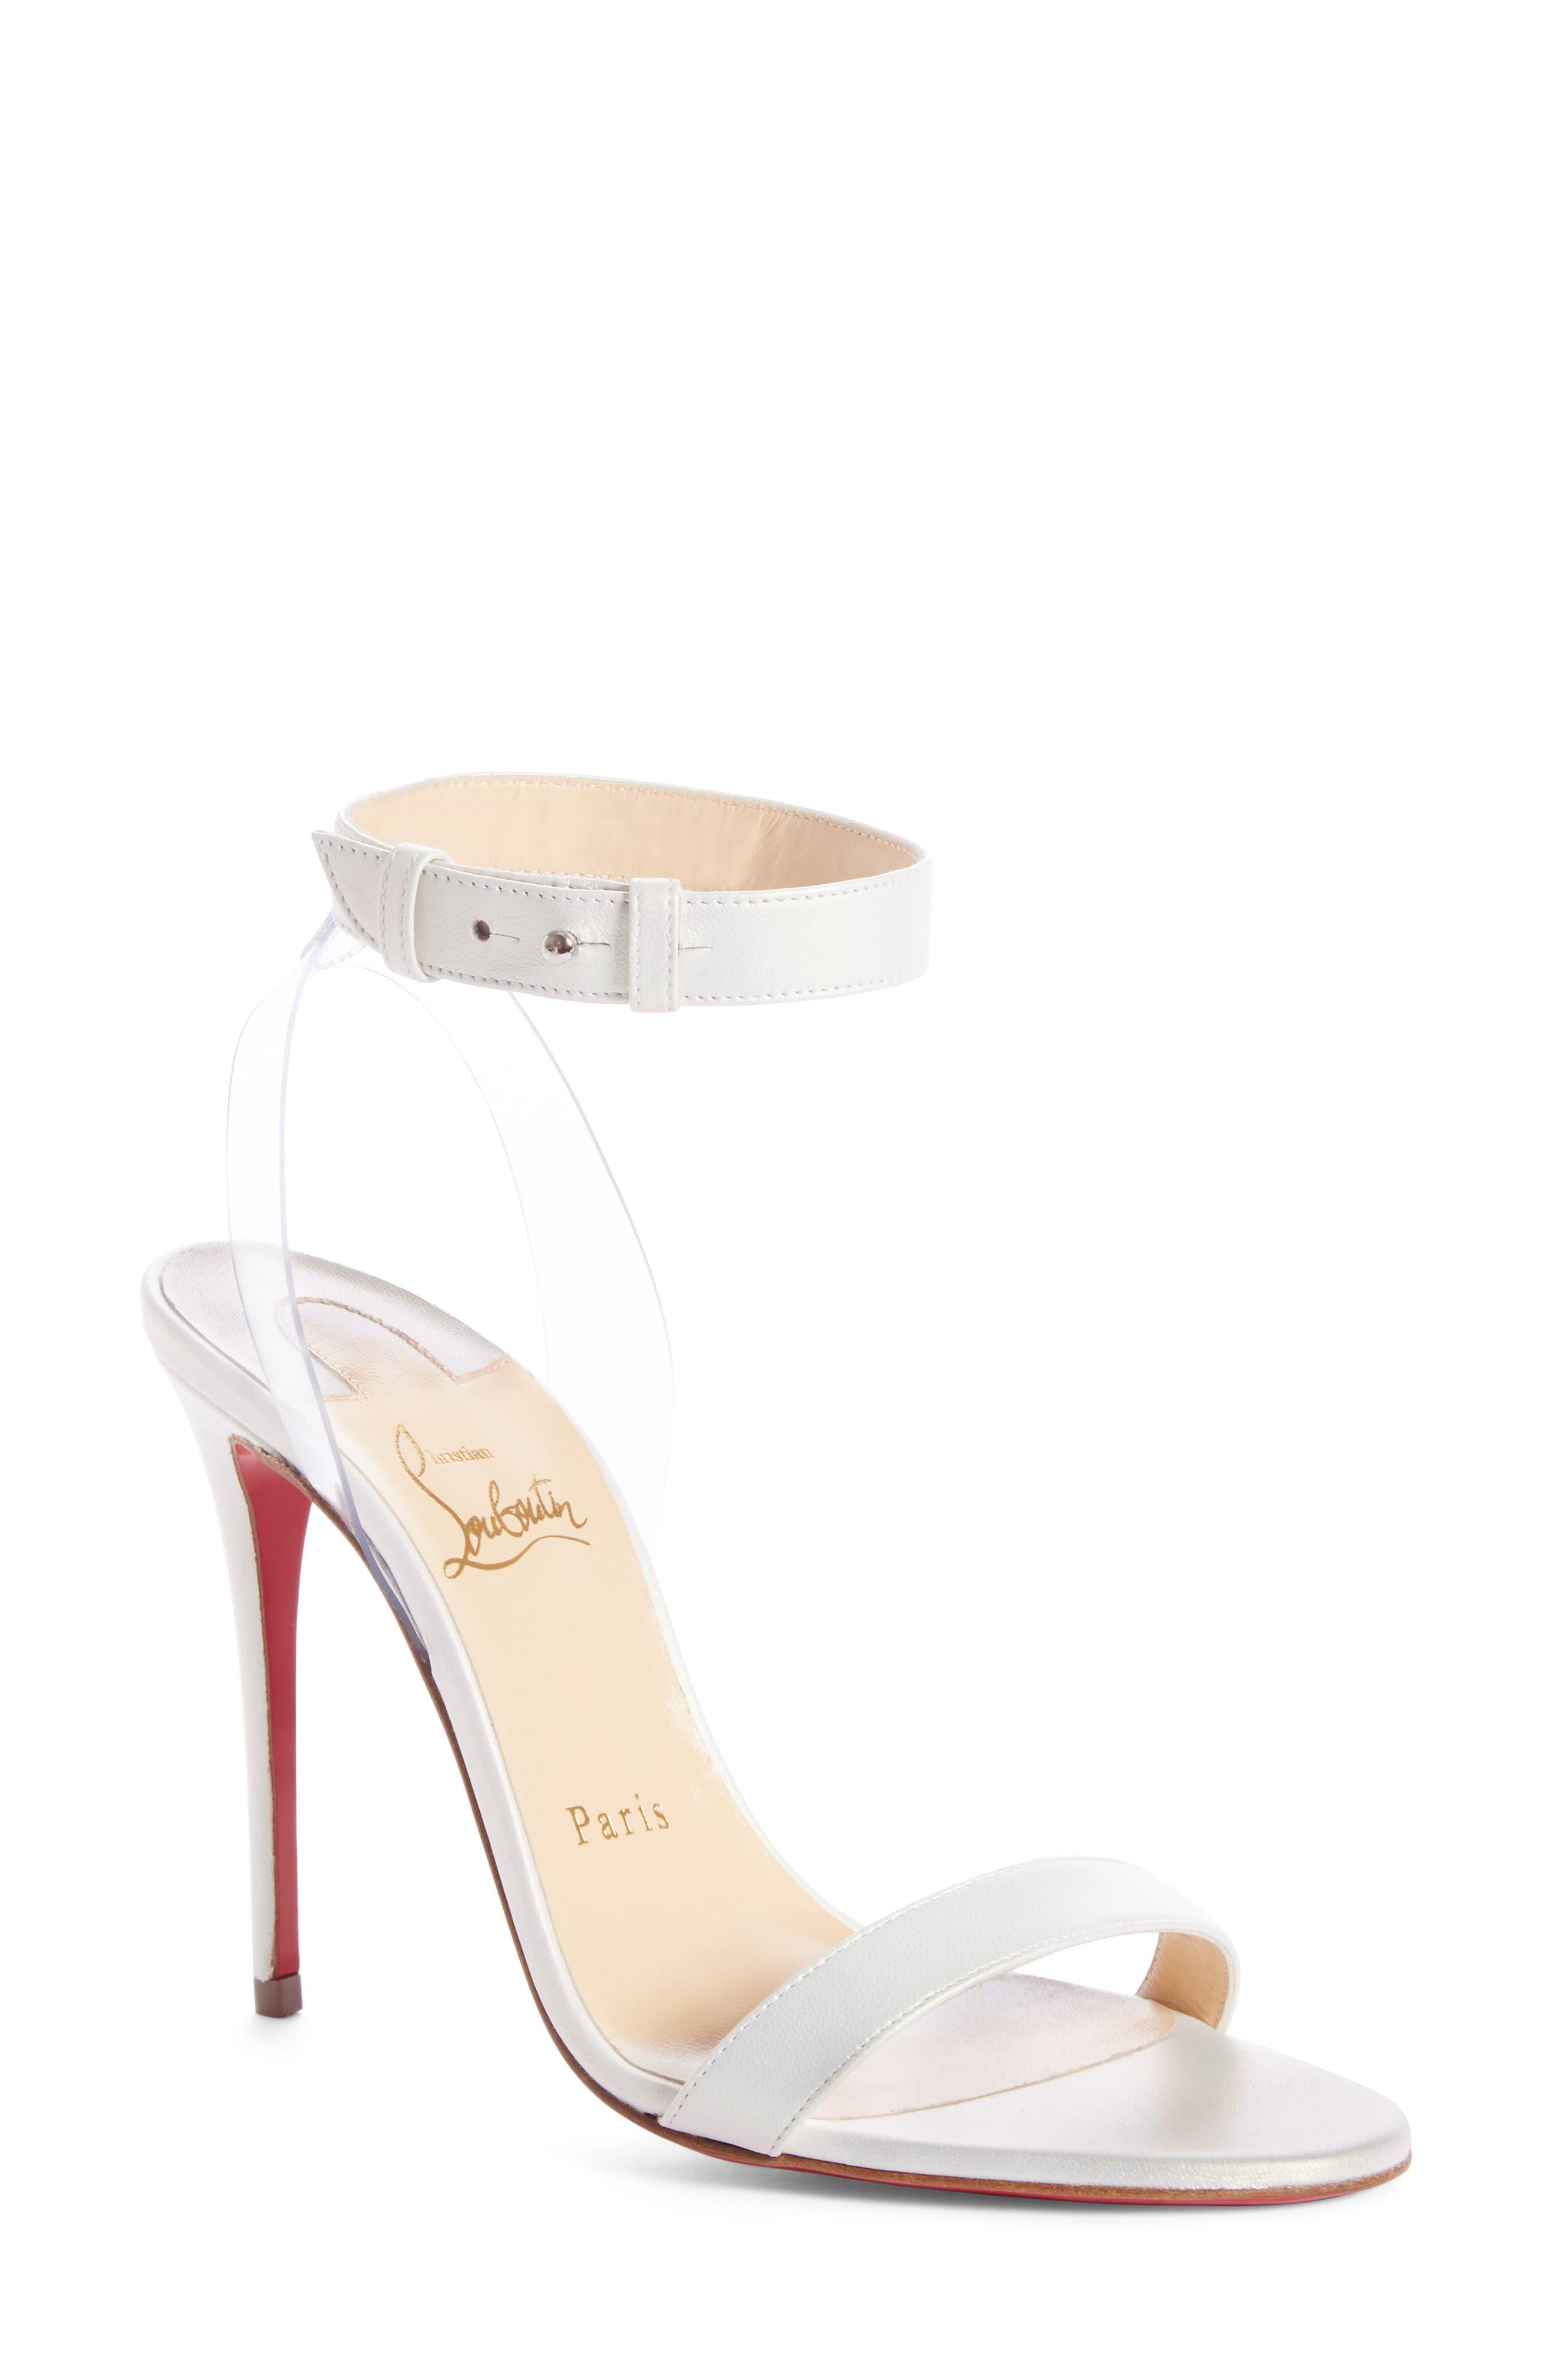 fee417cf22c5 Women s Christian Louboutin Sandals